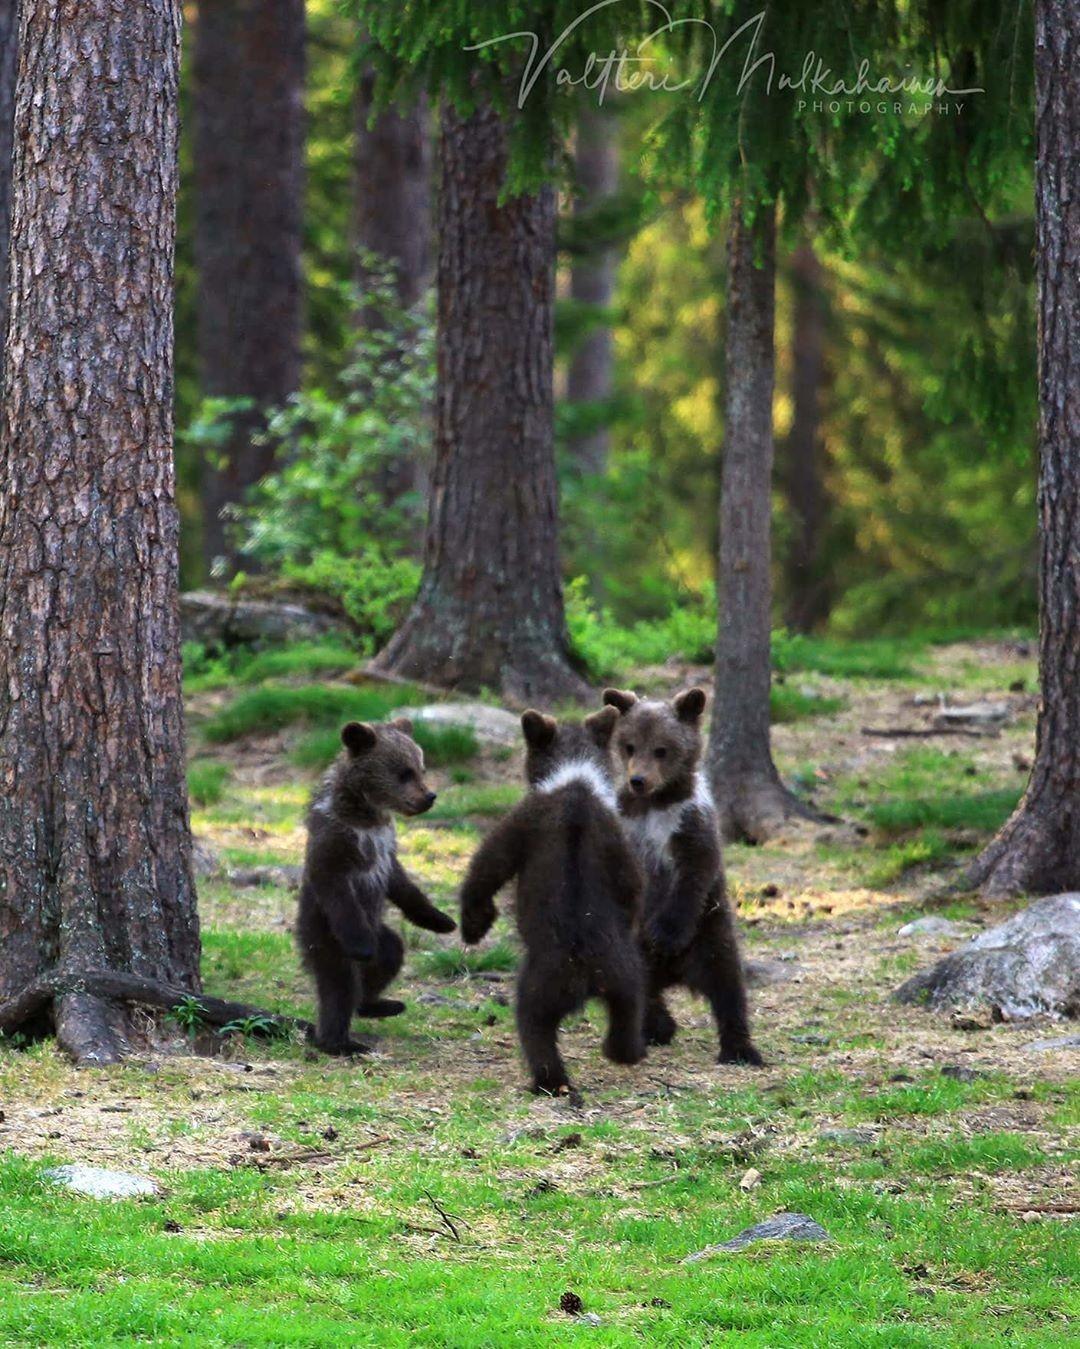 «Танец маленьких медвежат». Автор Валттери Мулкахайнен